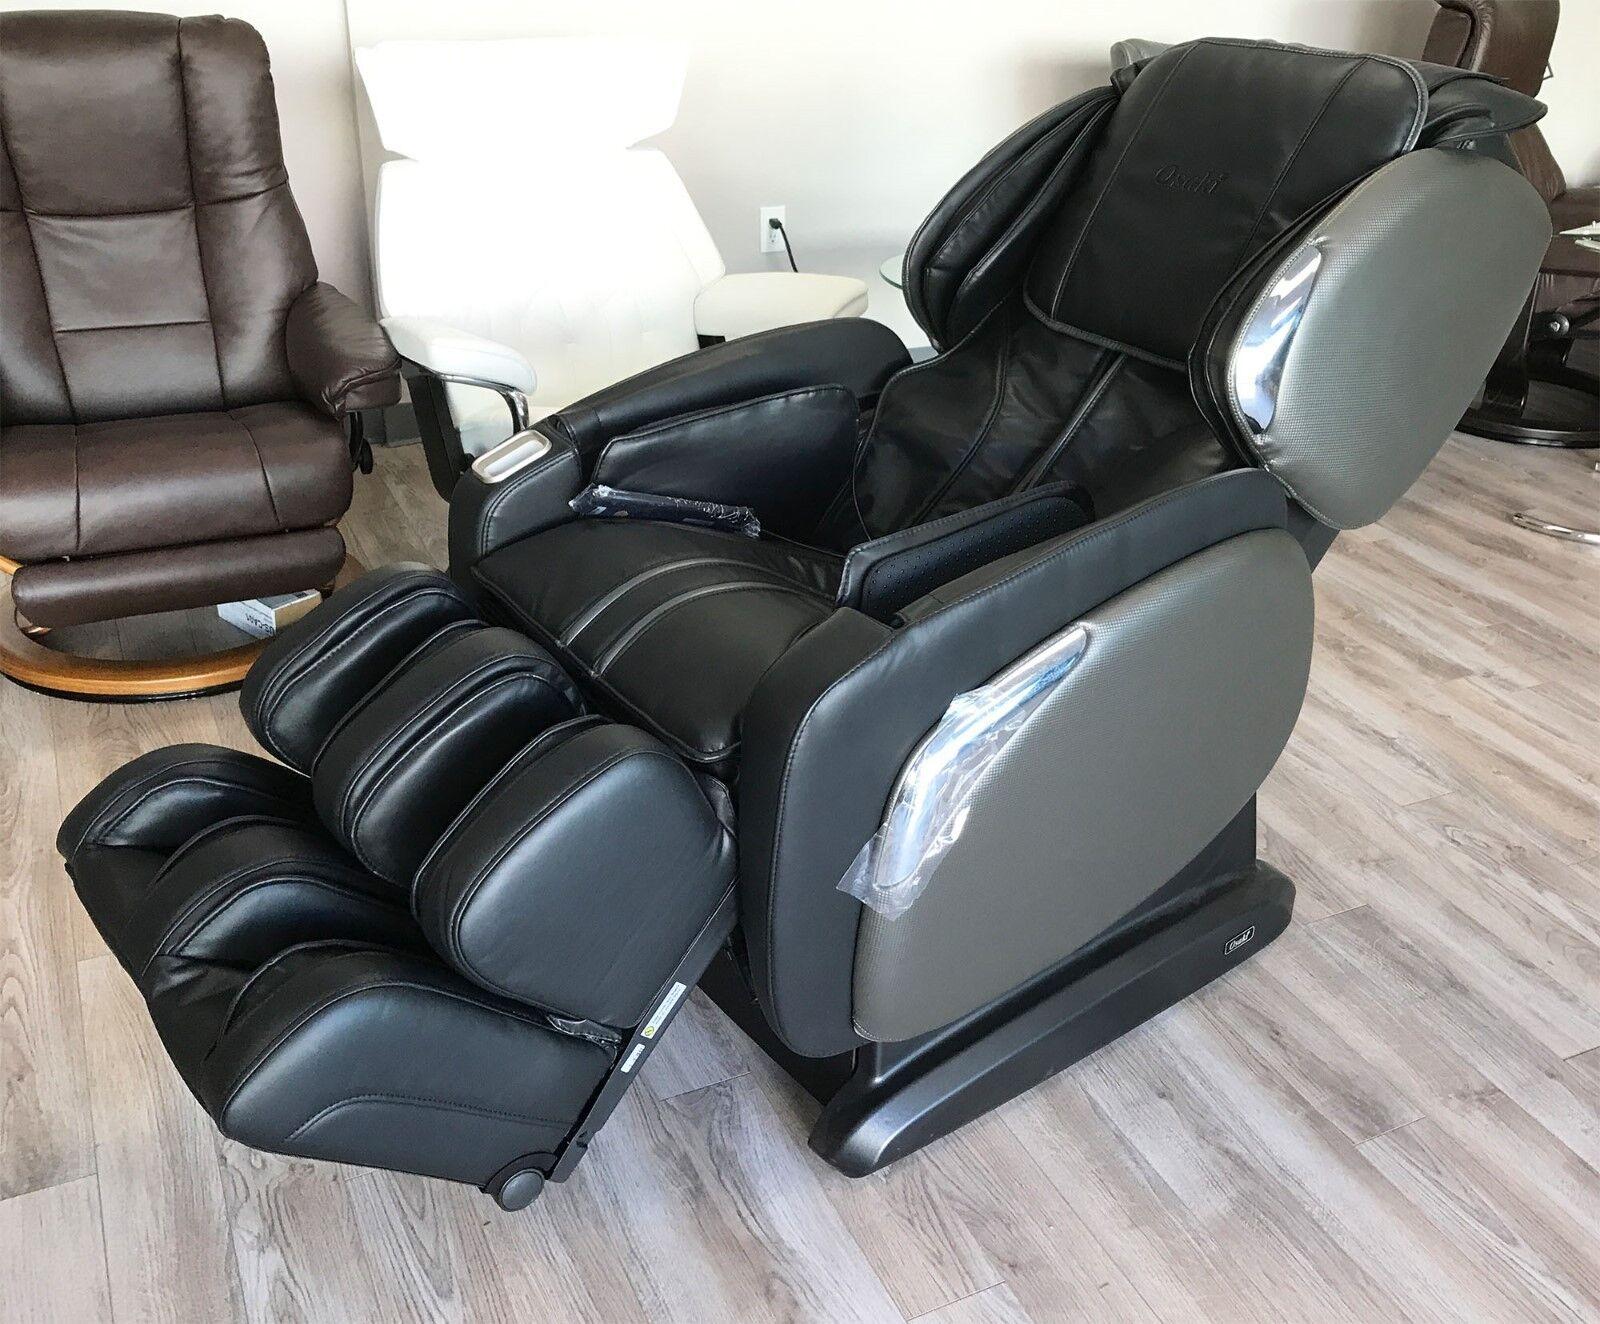 Recliner Massage Chair BestMassage EC77 Electric Full Body